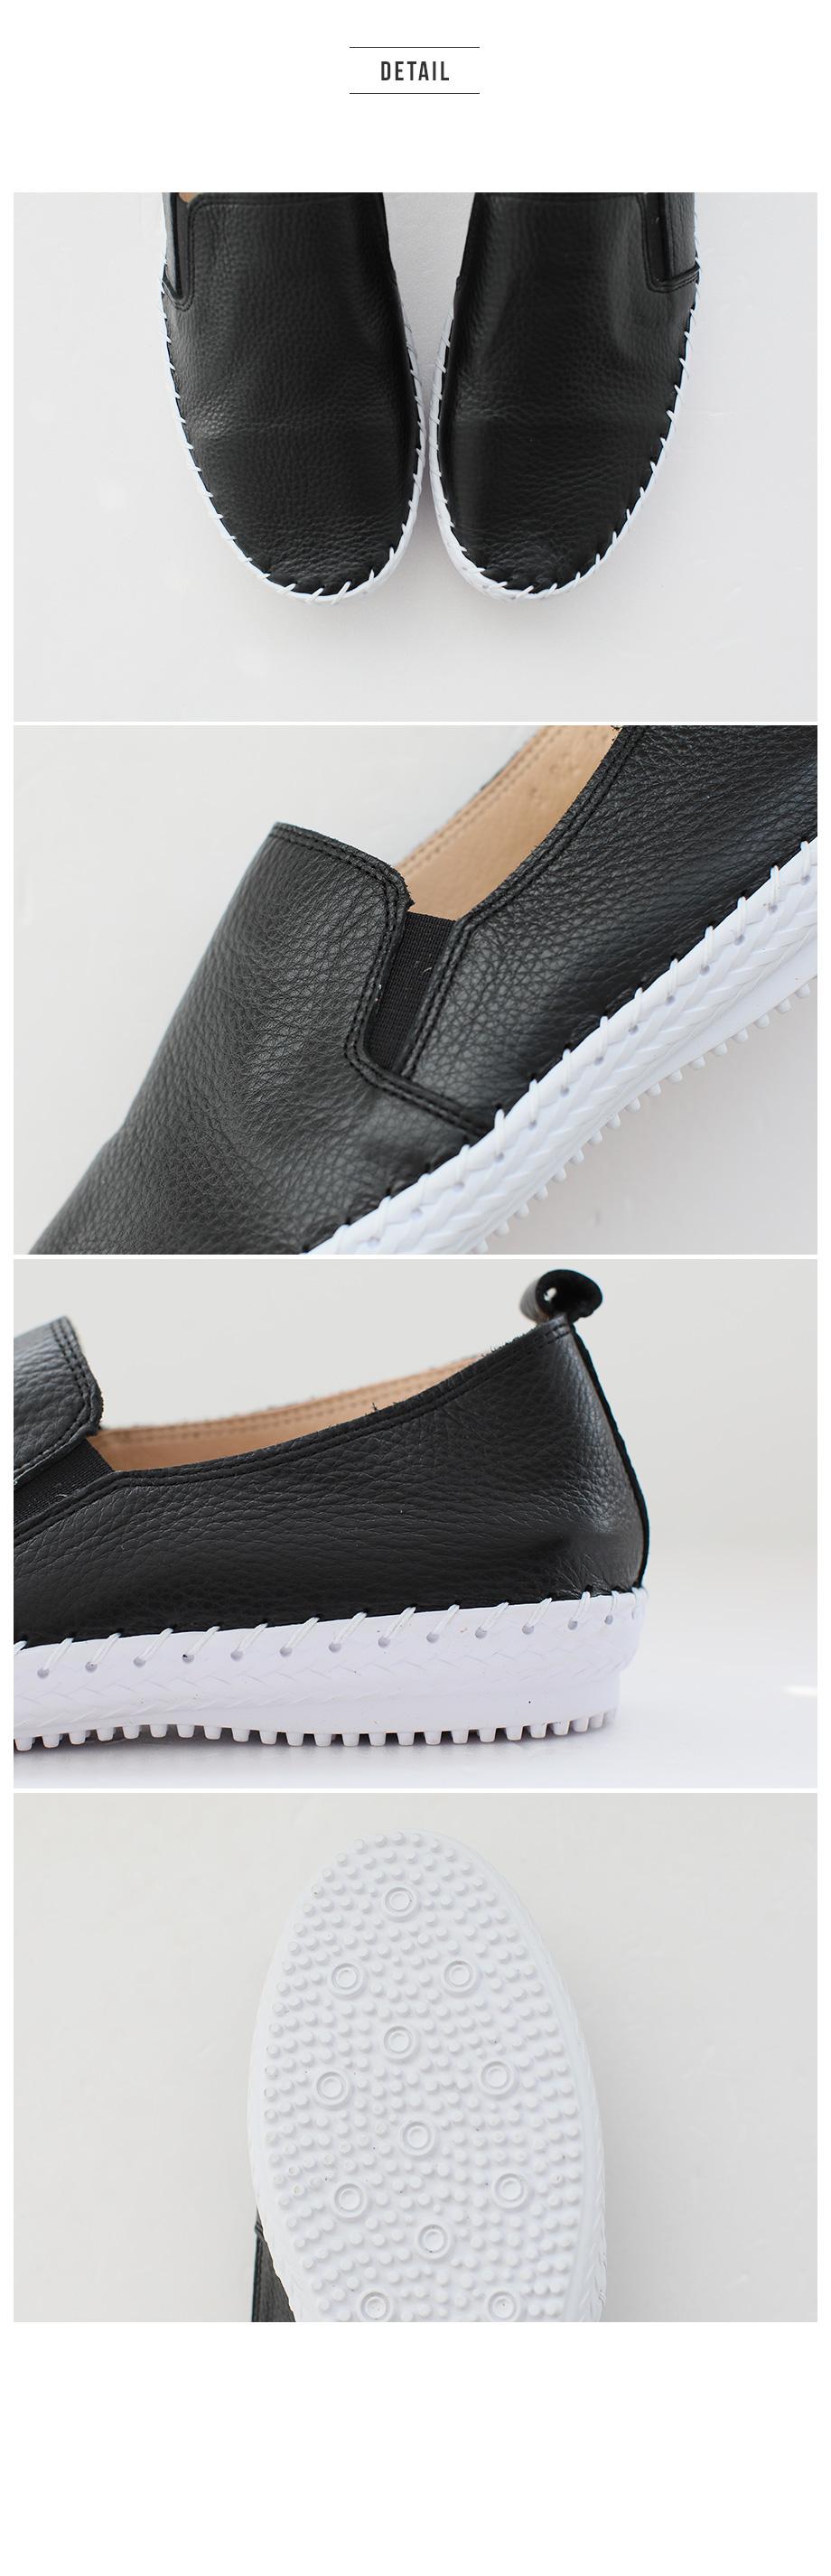 Peydin high-key leather slip-on 5cm